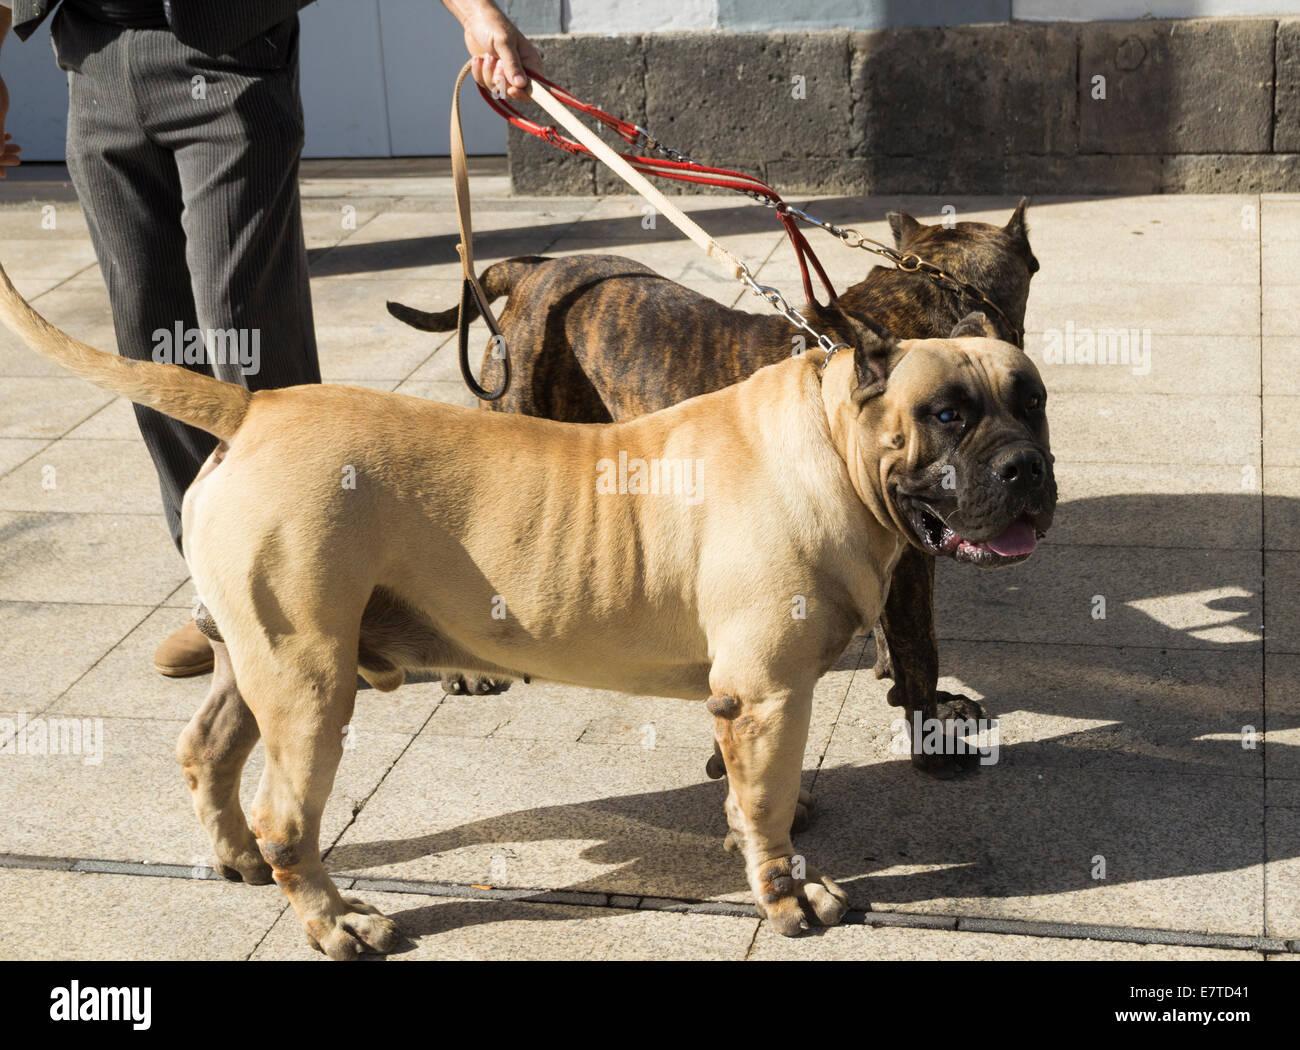 Big Dogs In Spanish